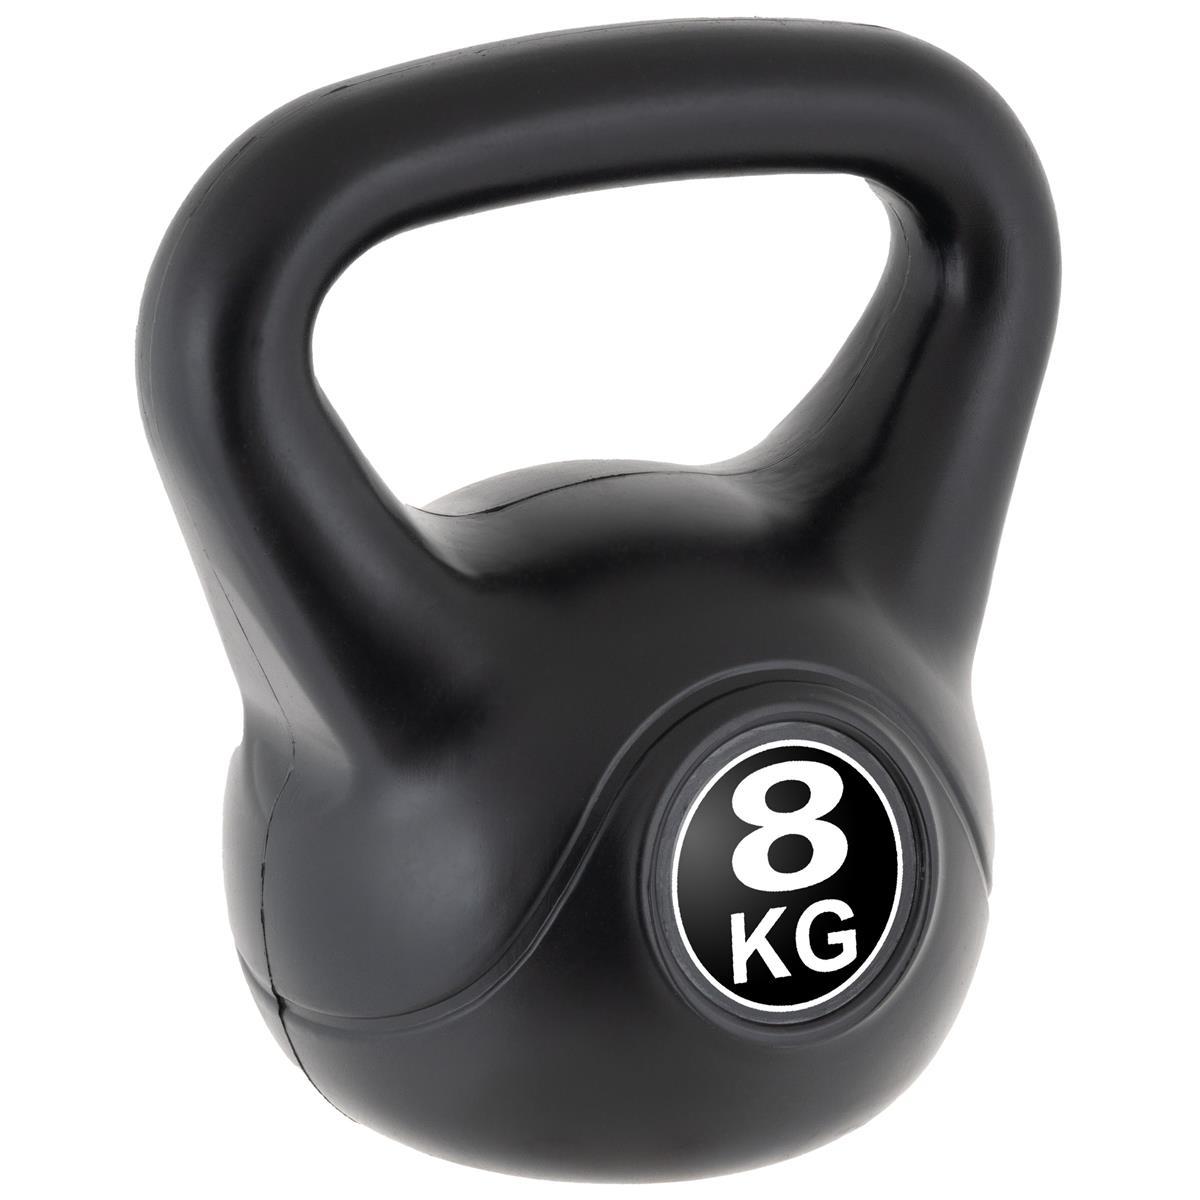 MAXXIVA Kettlebell Kugelhantel 8kg schwarz Krafttraining Fitness Rundhantel